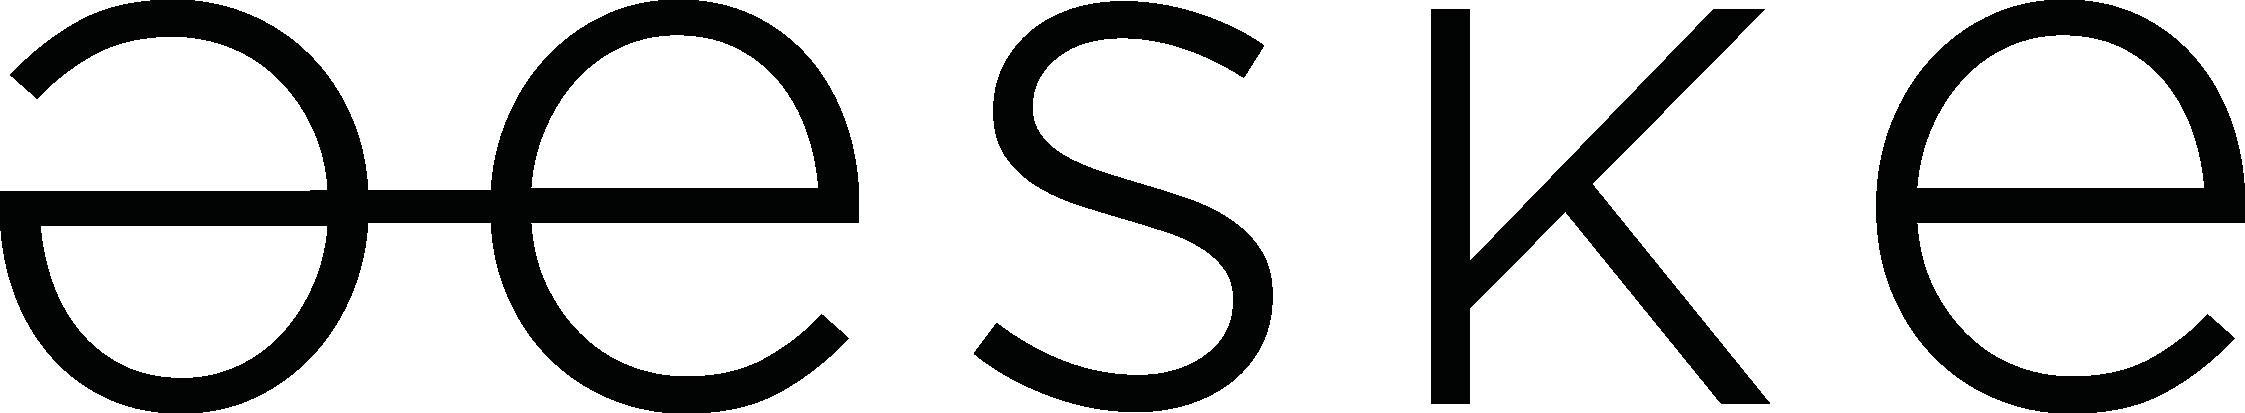 aeske_logo.png